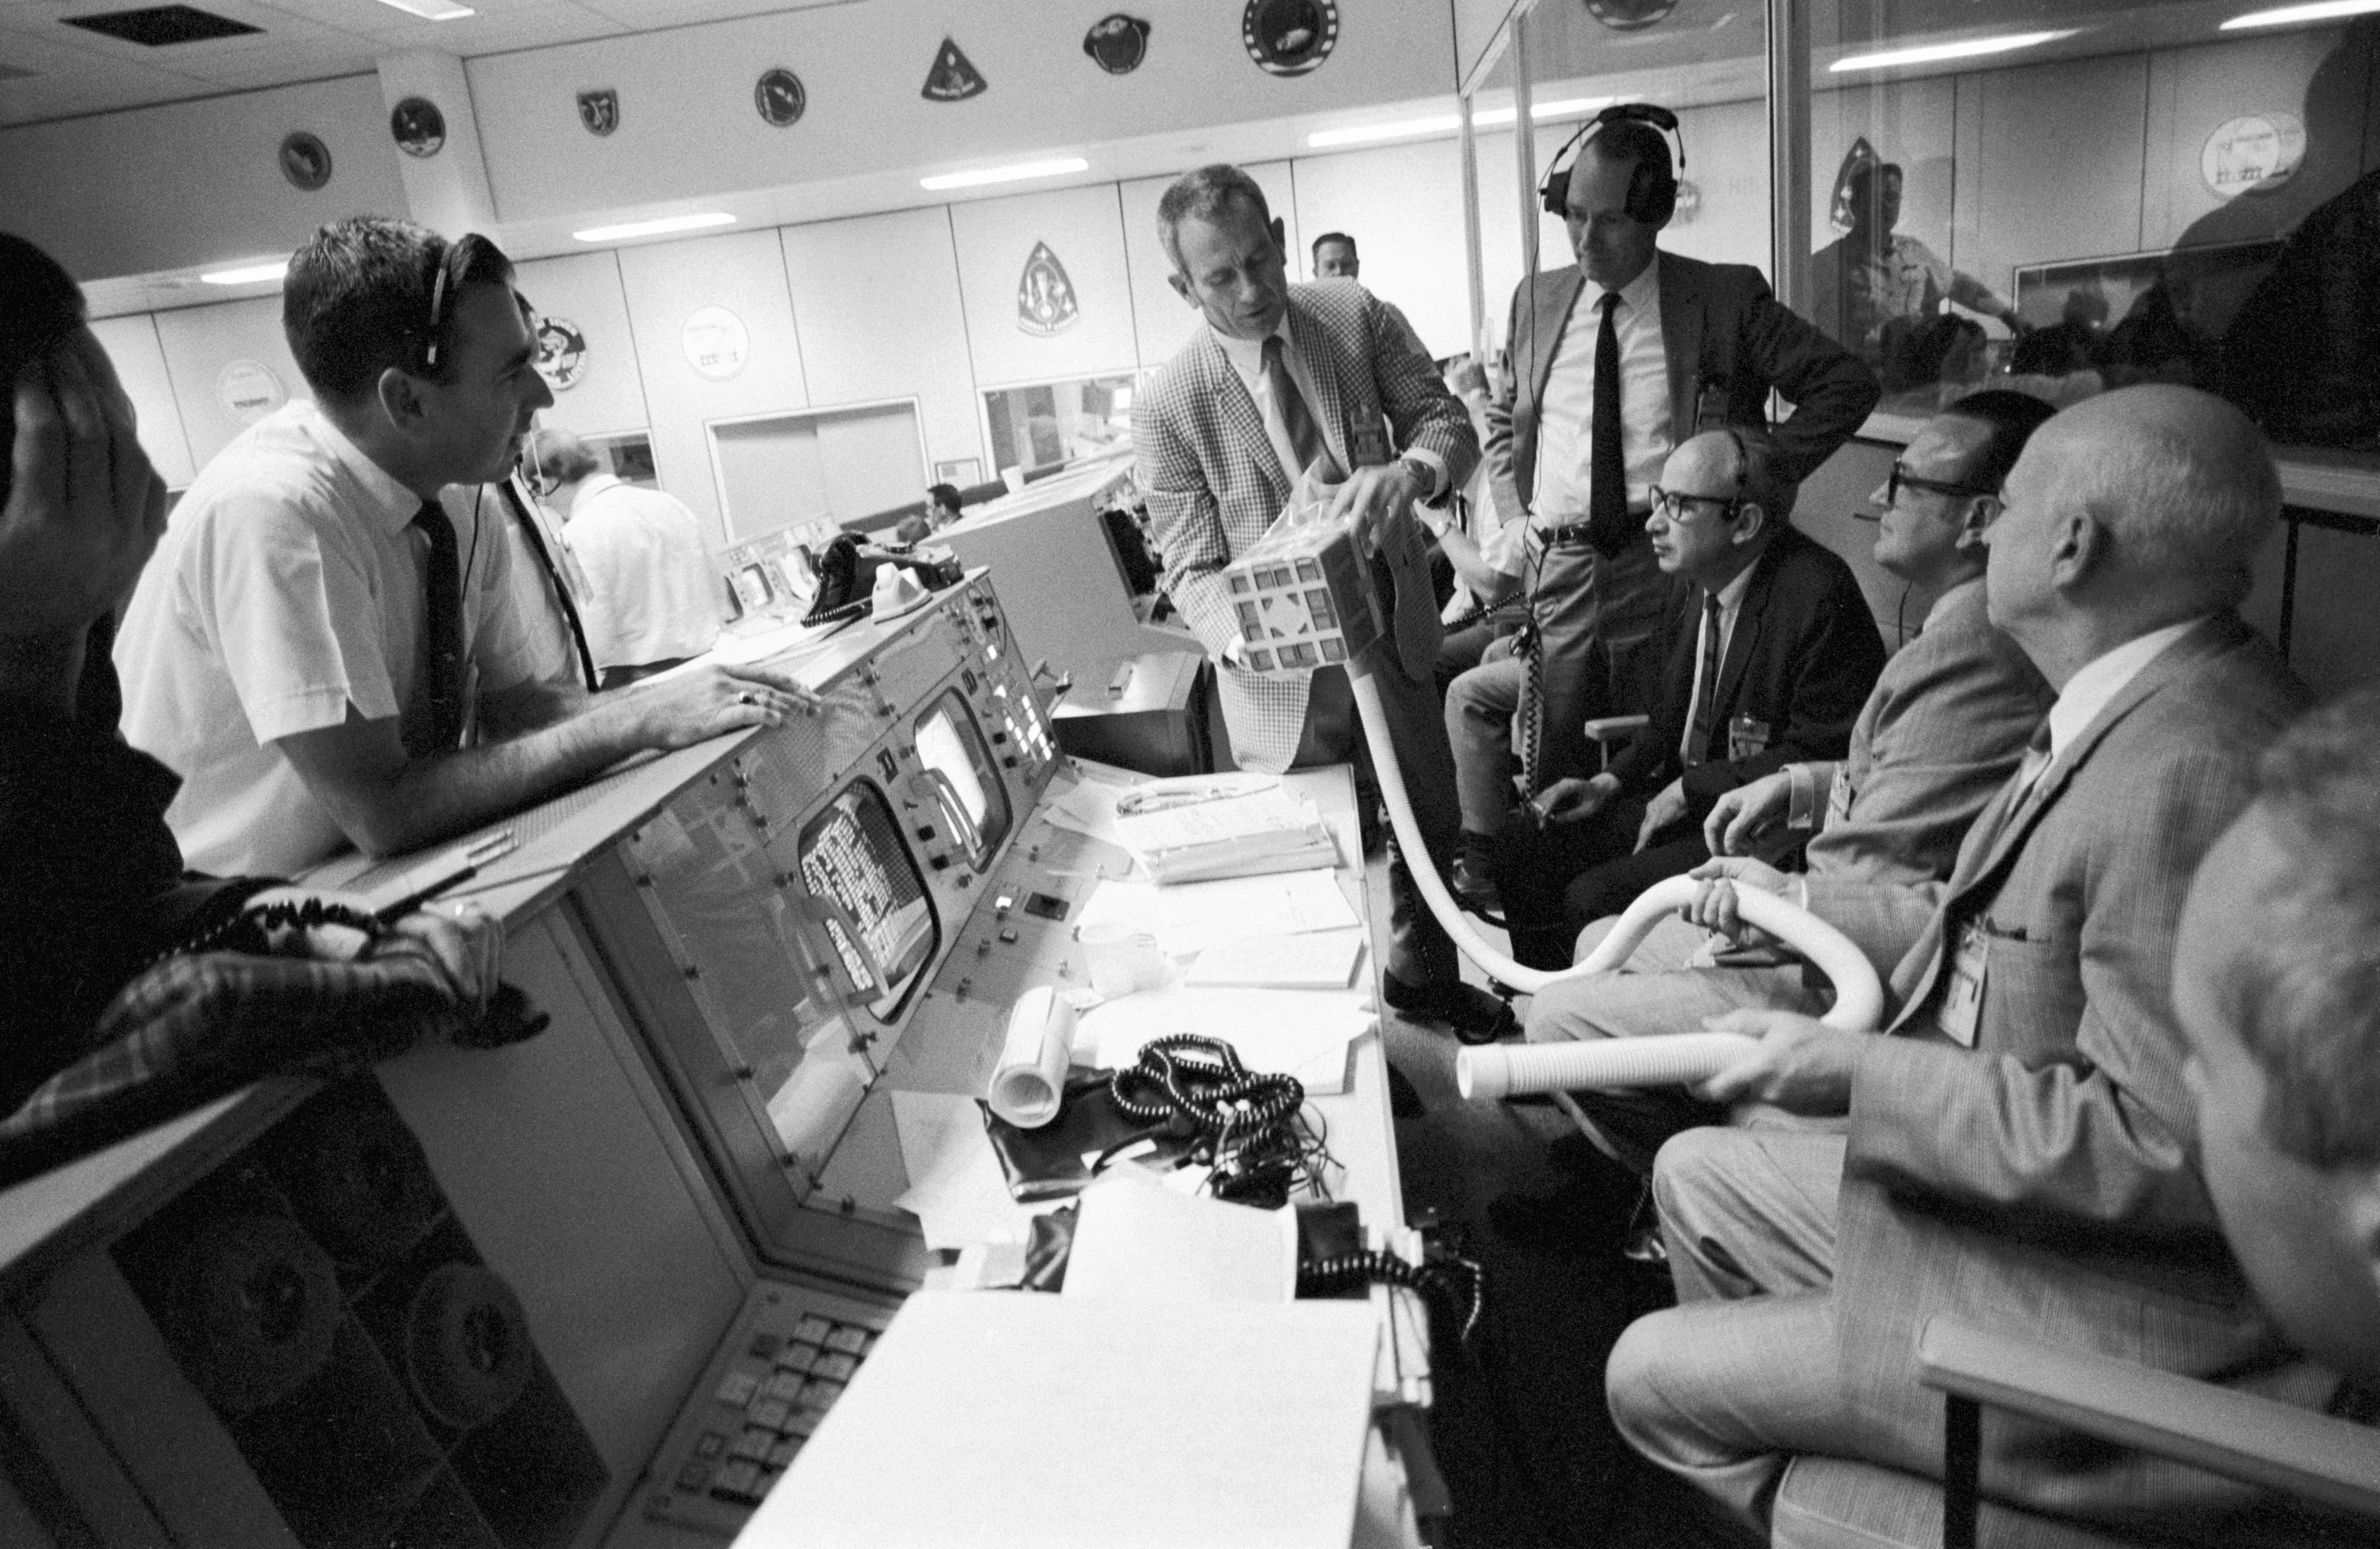 Apollo_13_Mailbox_at_Mission_Control.jpg